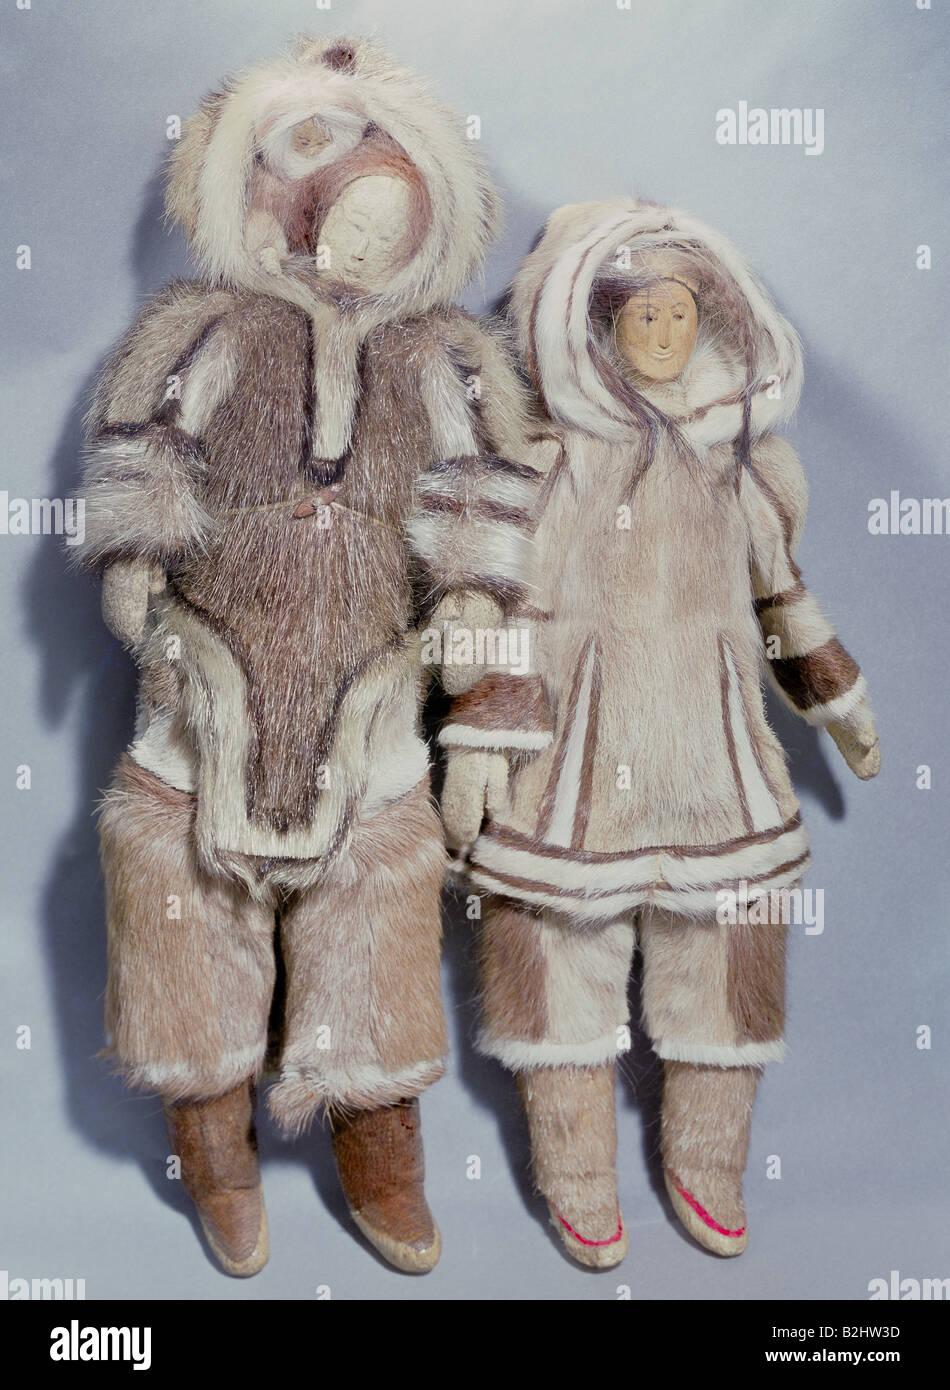 Windelmädchen, das in alaska datiert